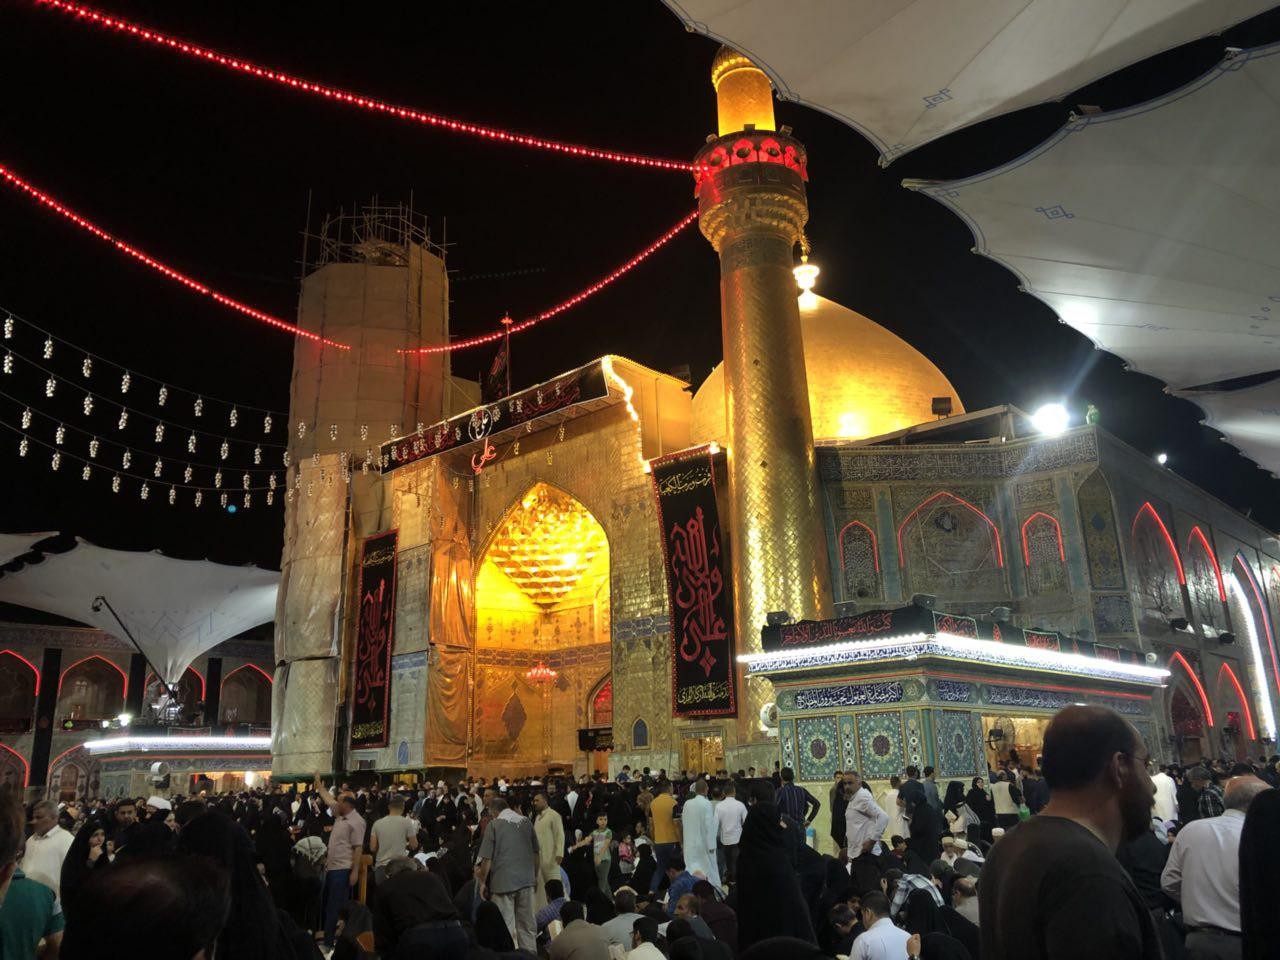 Photo of گزارش تصویری حرم مطهر امیرالمومنین علیه السلام در شب ضربت خوردن مولای متقیان شهر مقدس نجف – شب ۱۹ رمضان ۱۴۳۹